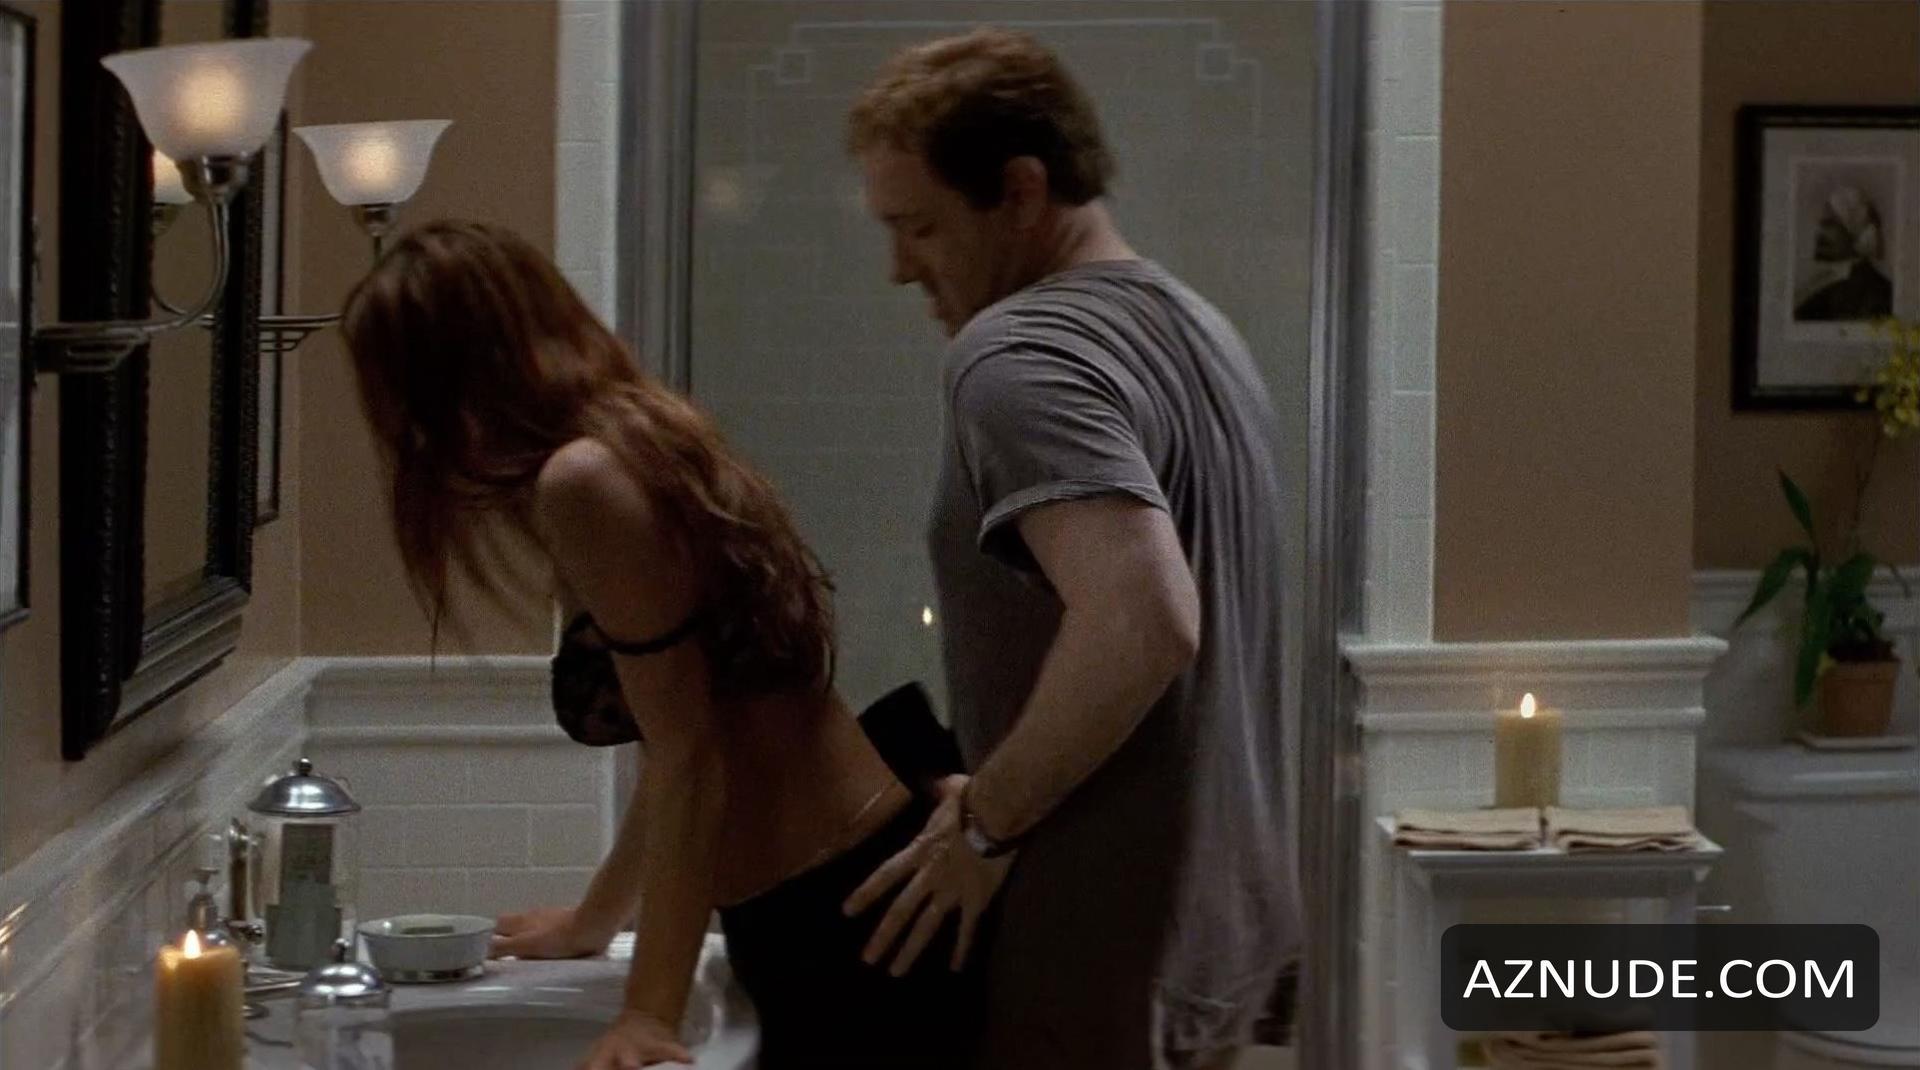 life of david gale sex scene clip